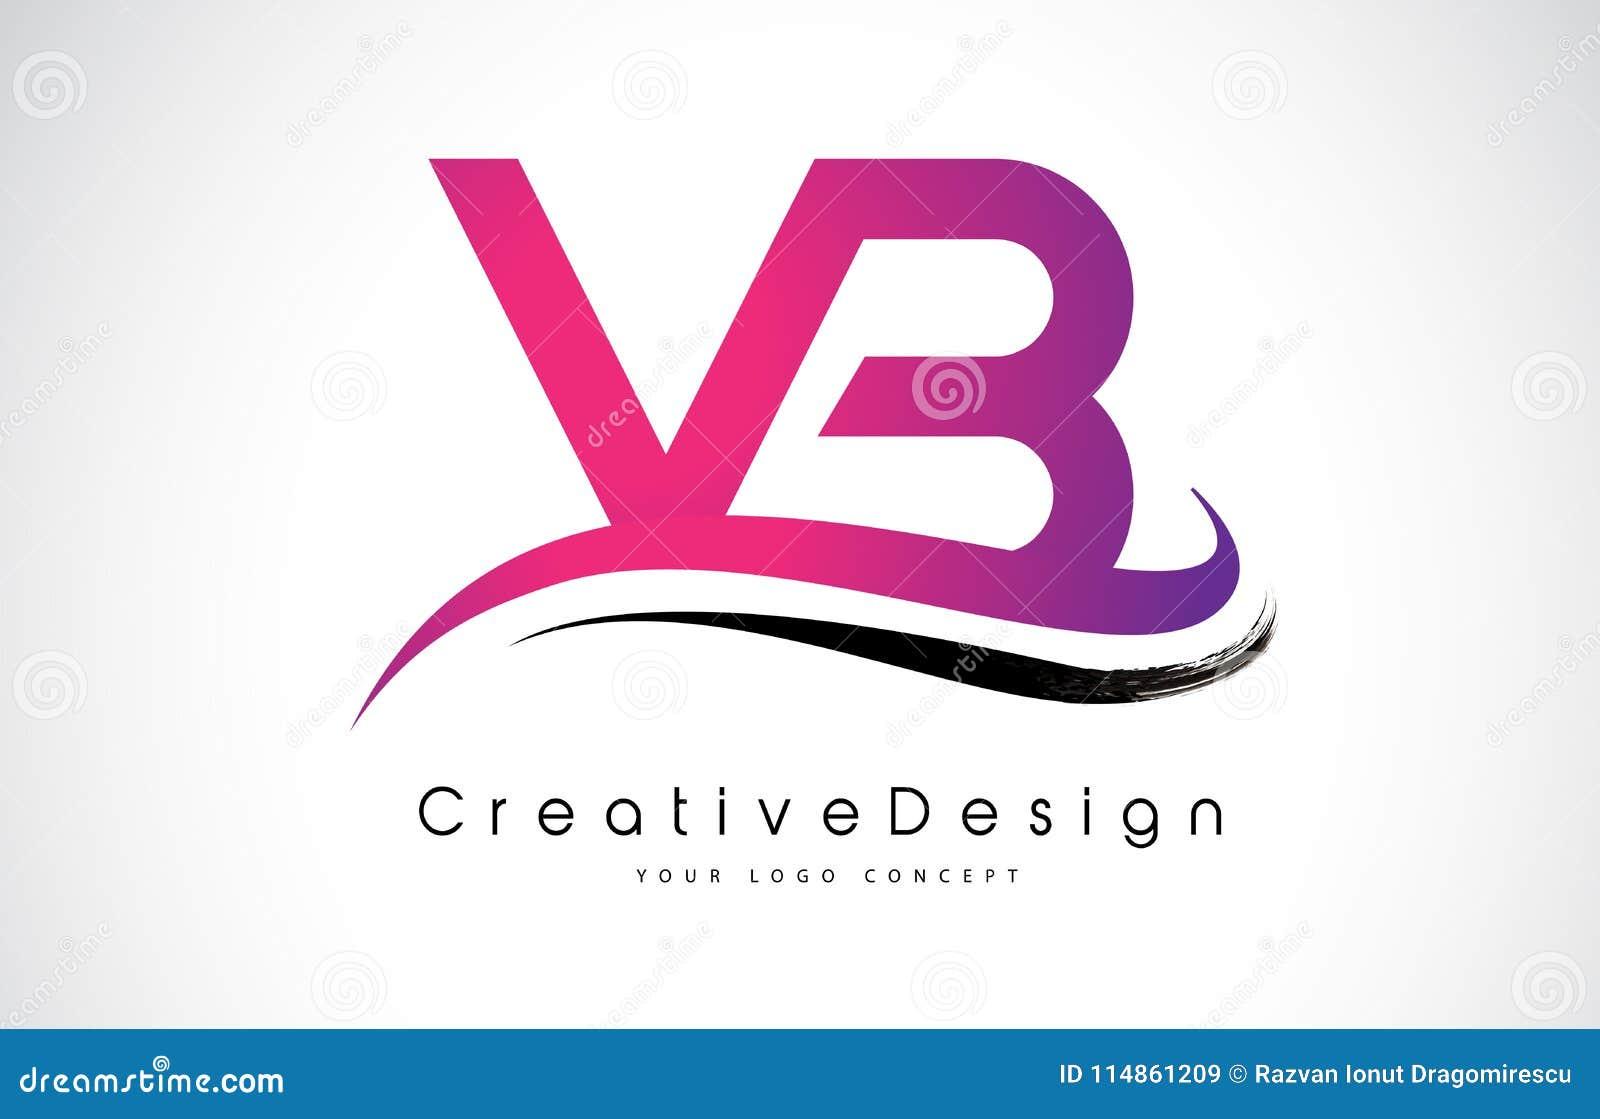 VB V B Letter Logo Design. Creative Icon Modern Letters Vector L ...